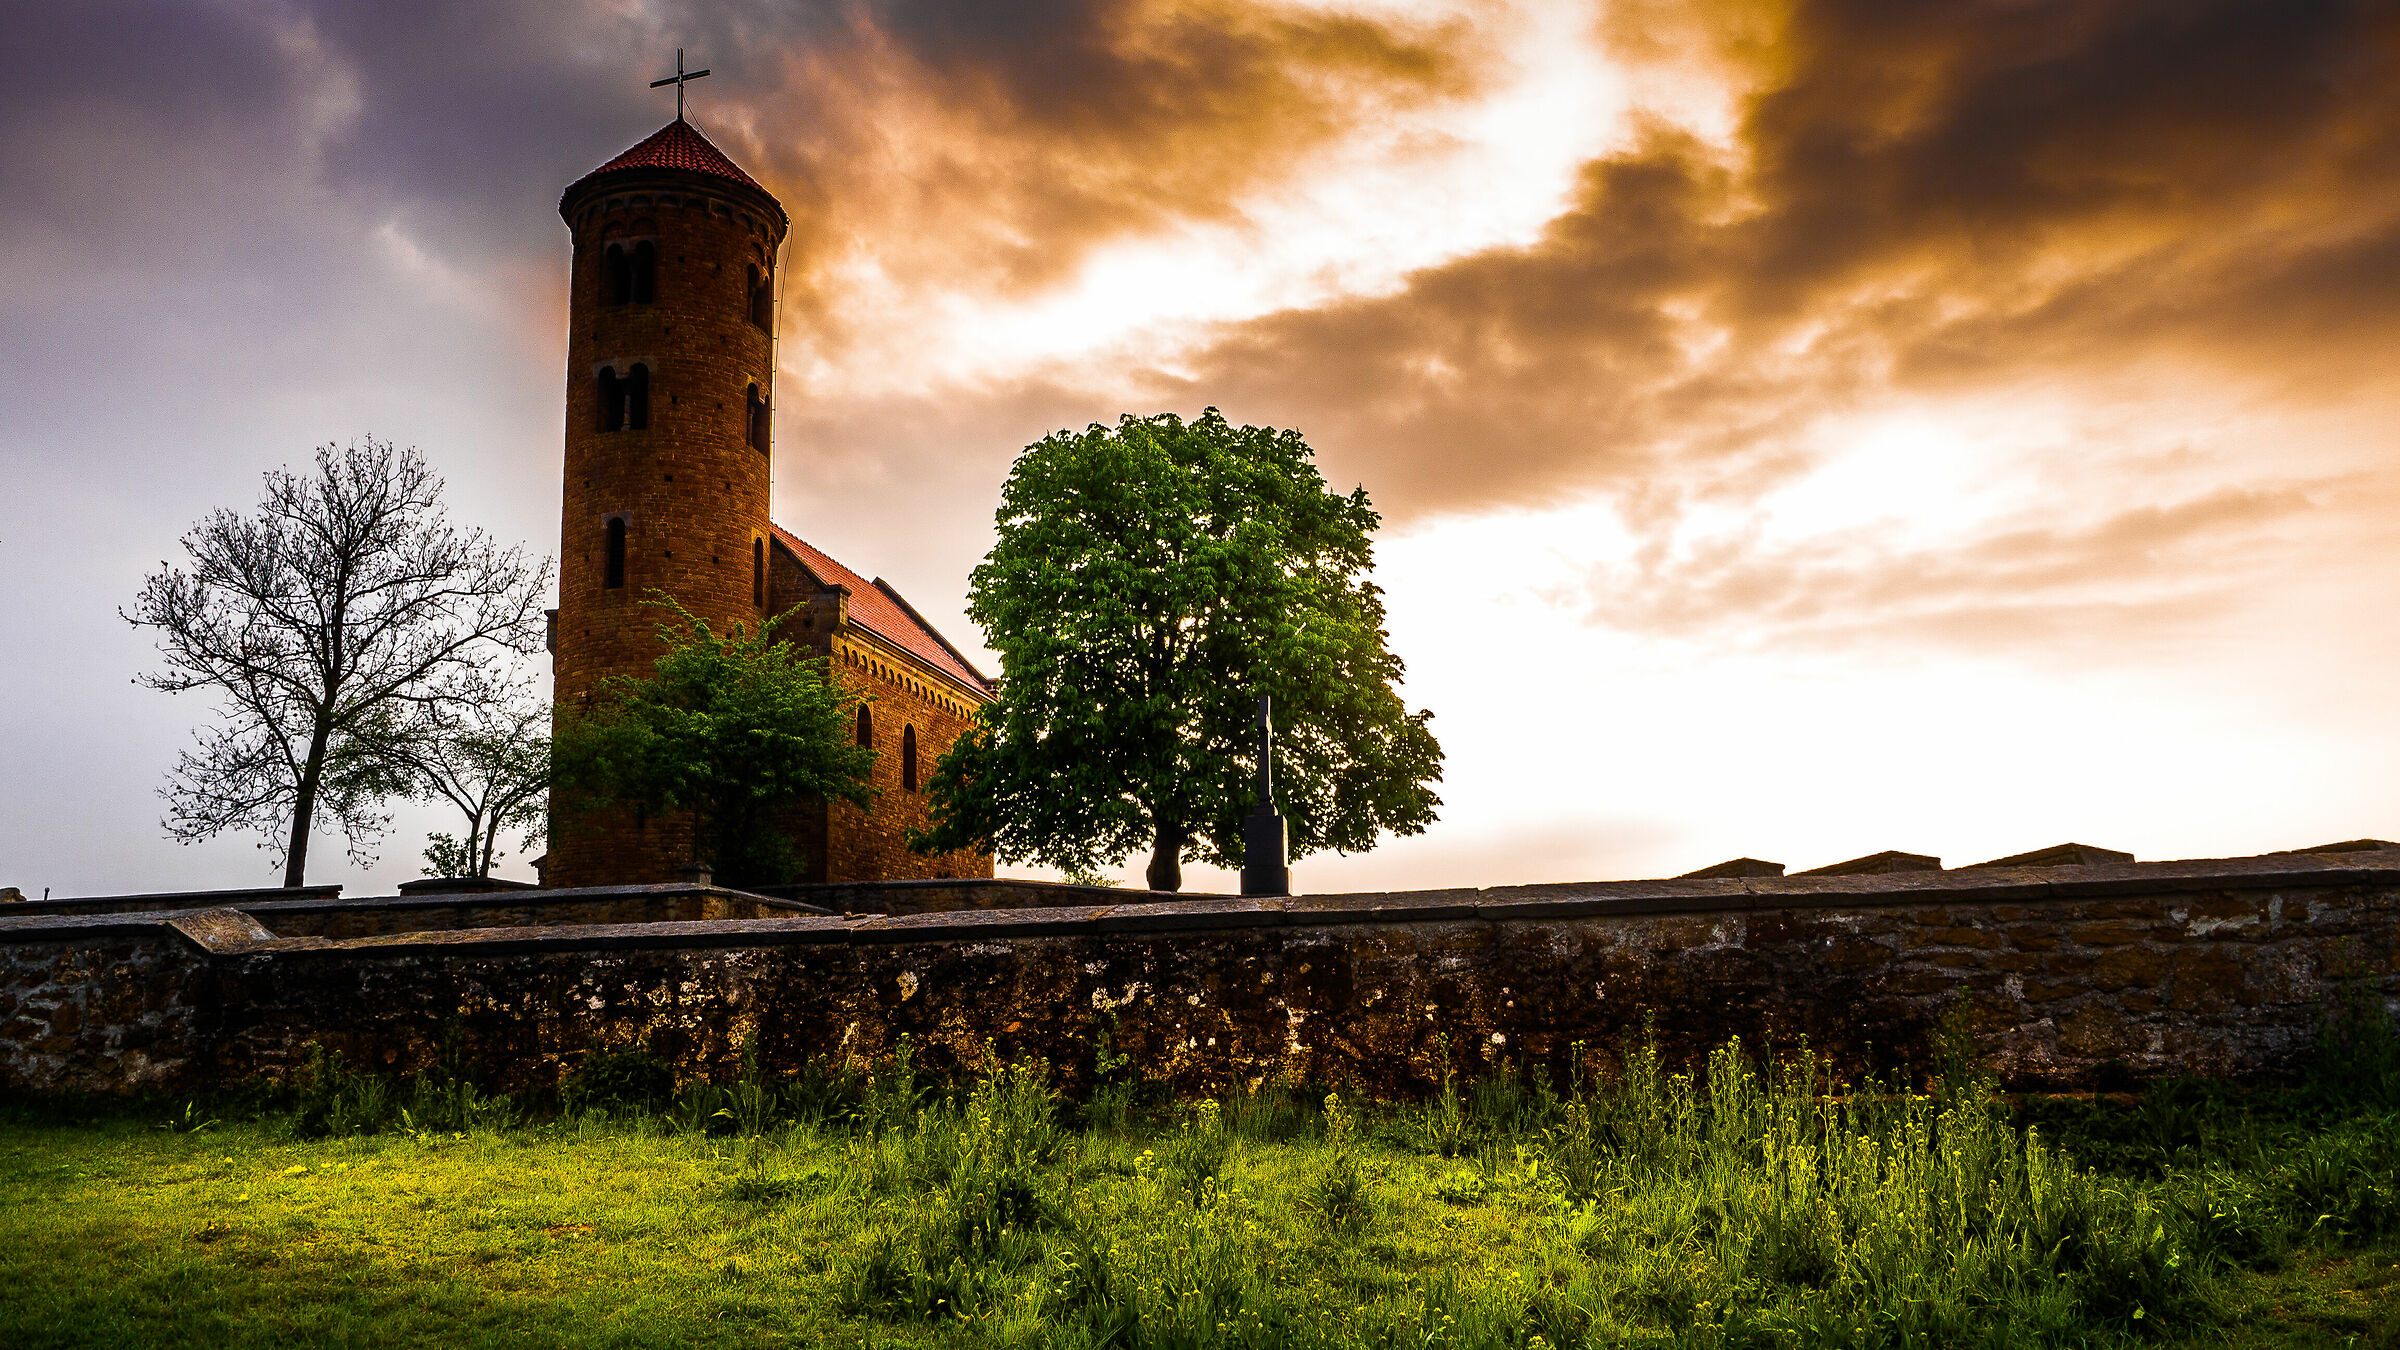 Church in Inowlodz...